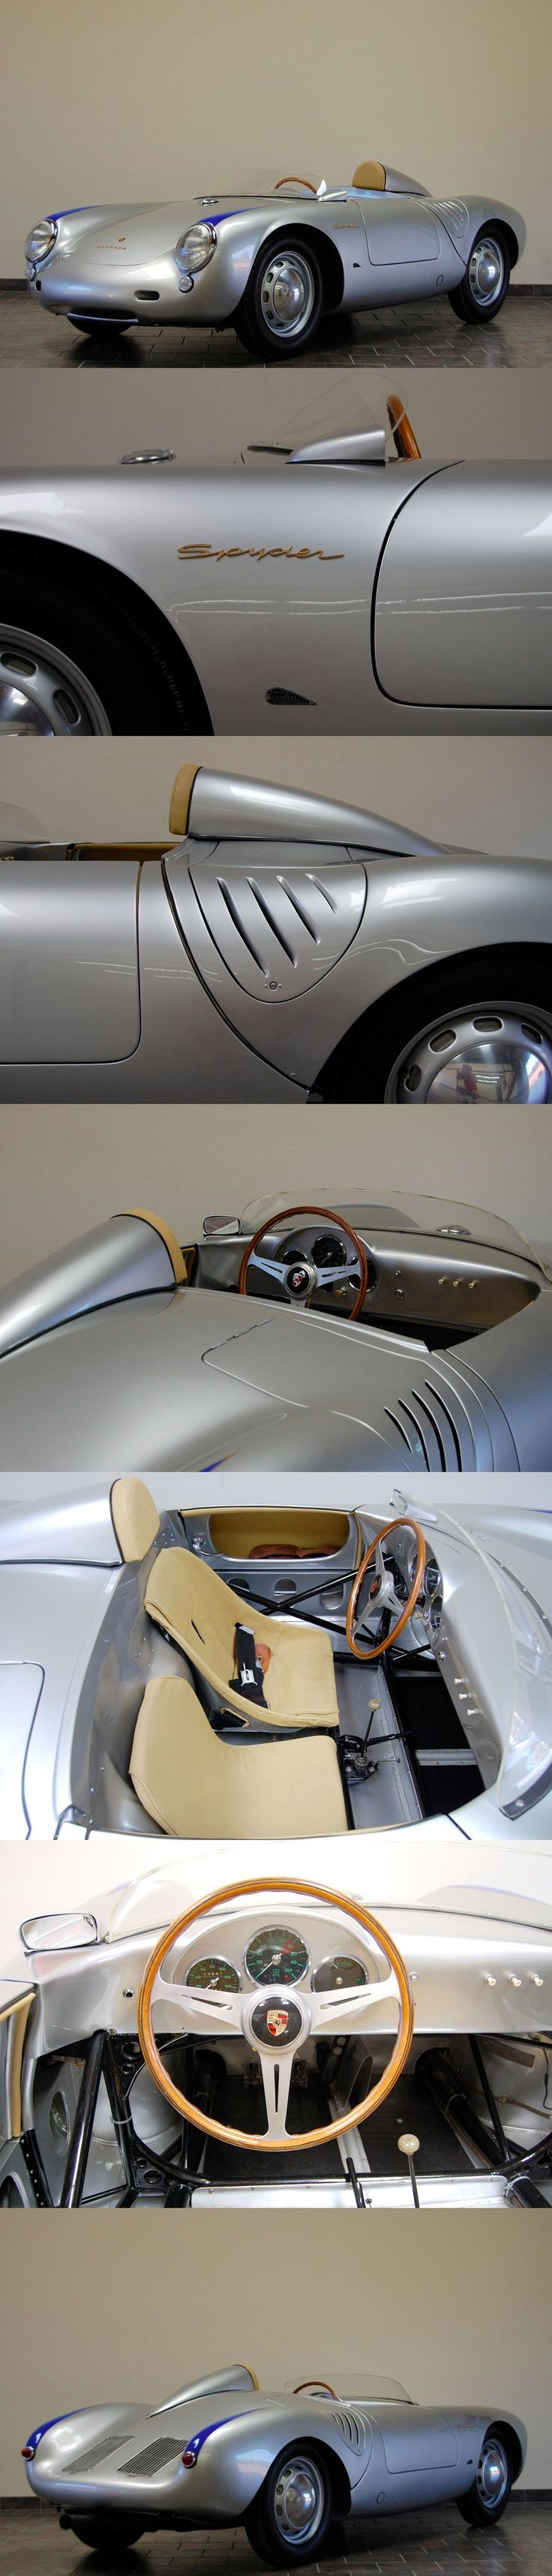 Porsche carrera gt old classic carsporsche